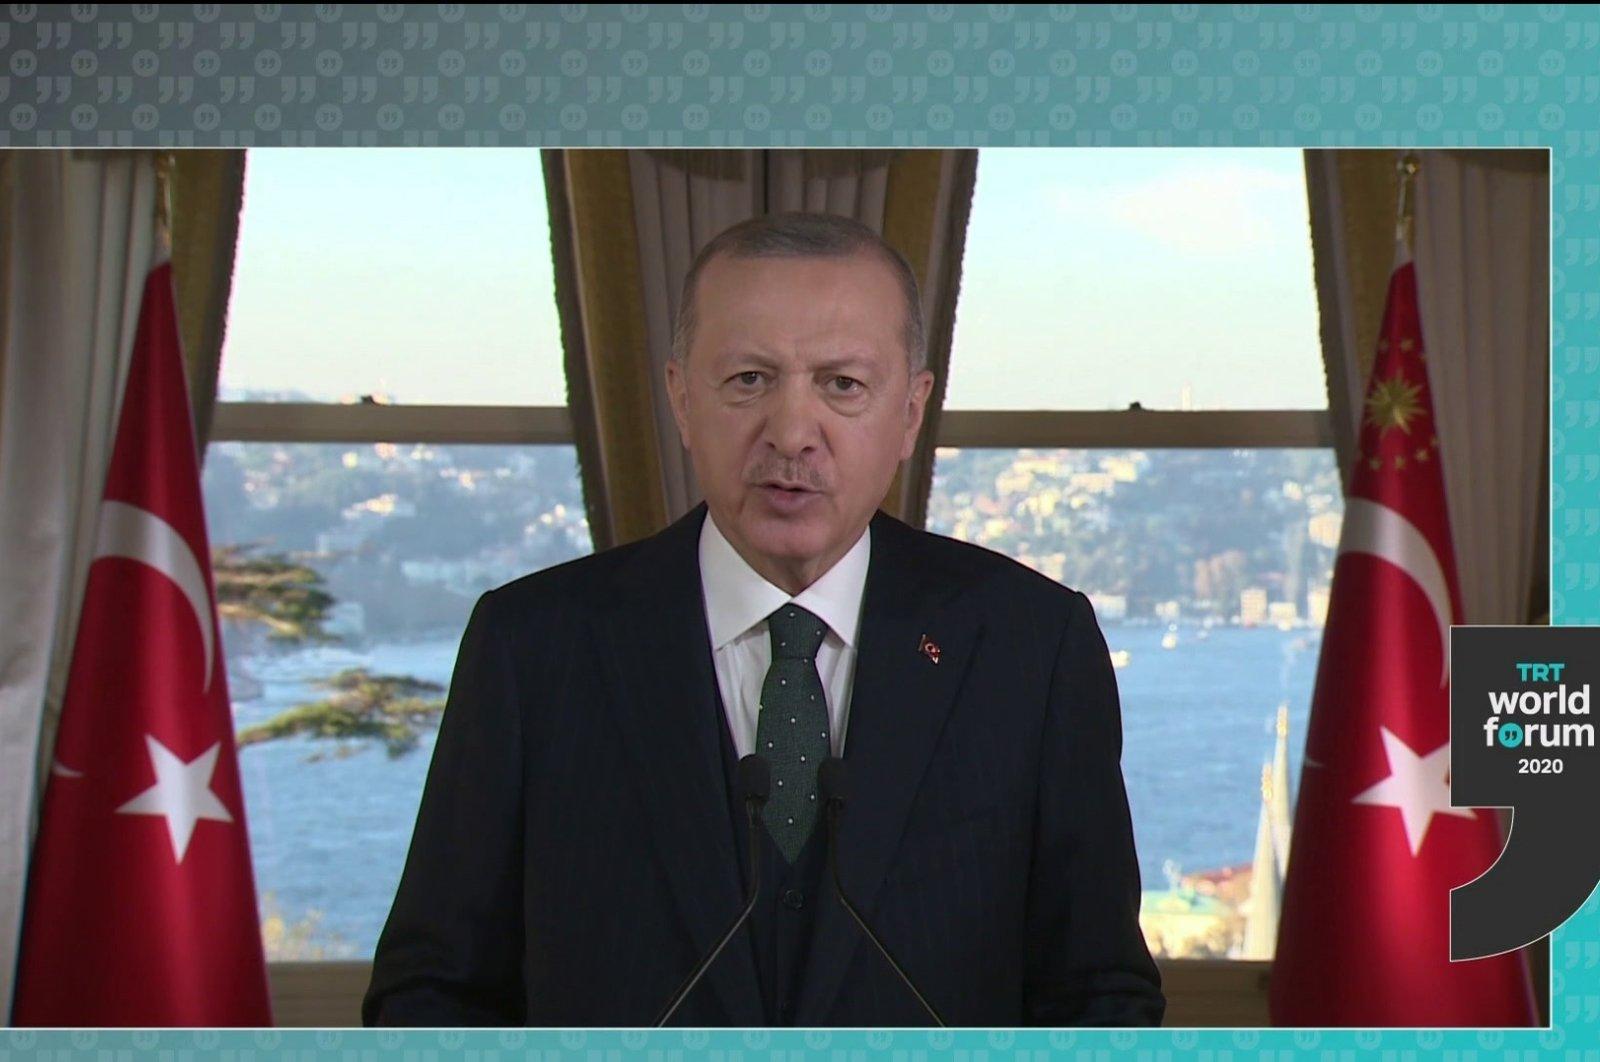 President Recep Tayyip Erdoğan speaks at the inaguartion ceremony of the fourth TRT World Forum, Dec.1, 2020. (IHA)